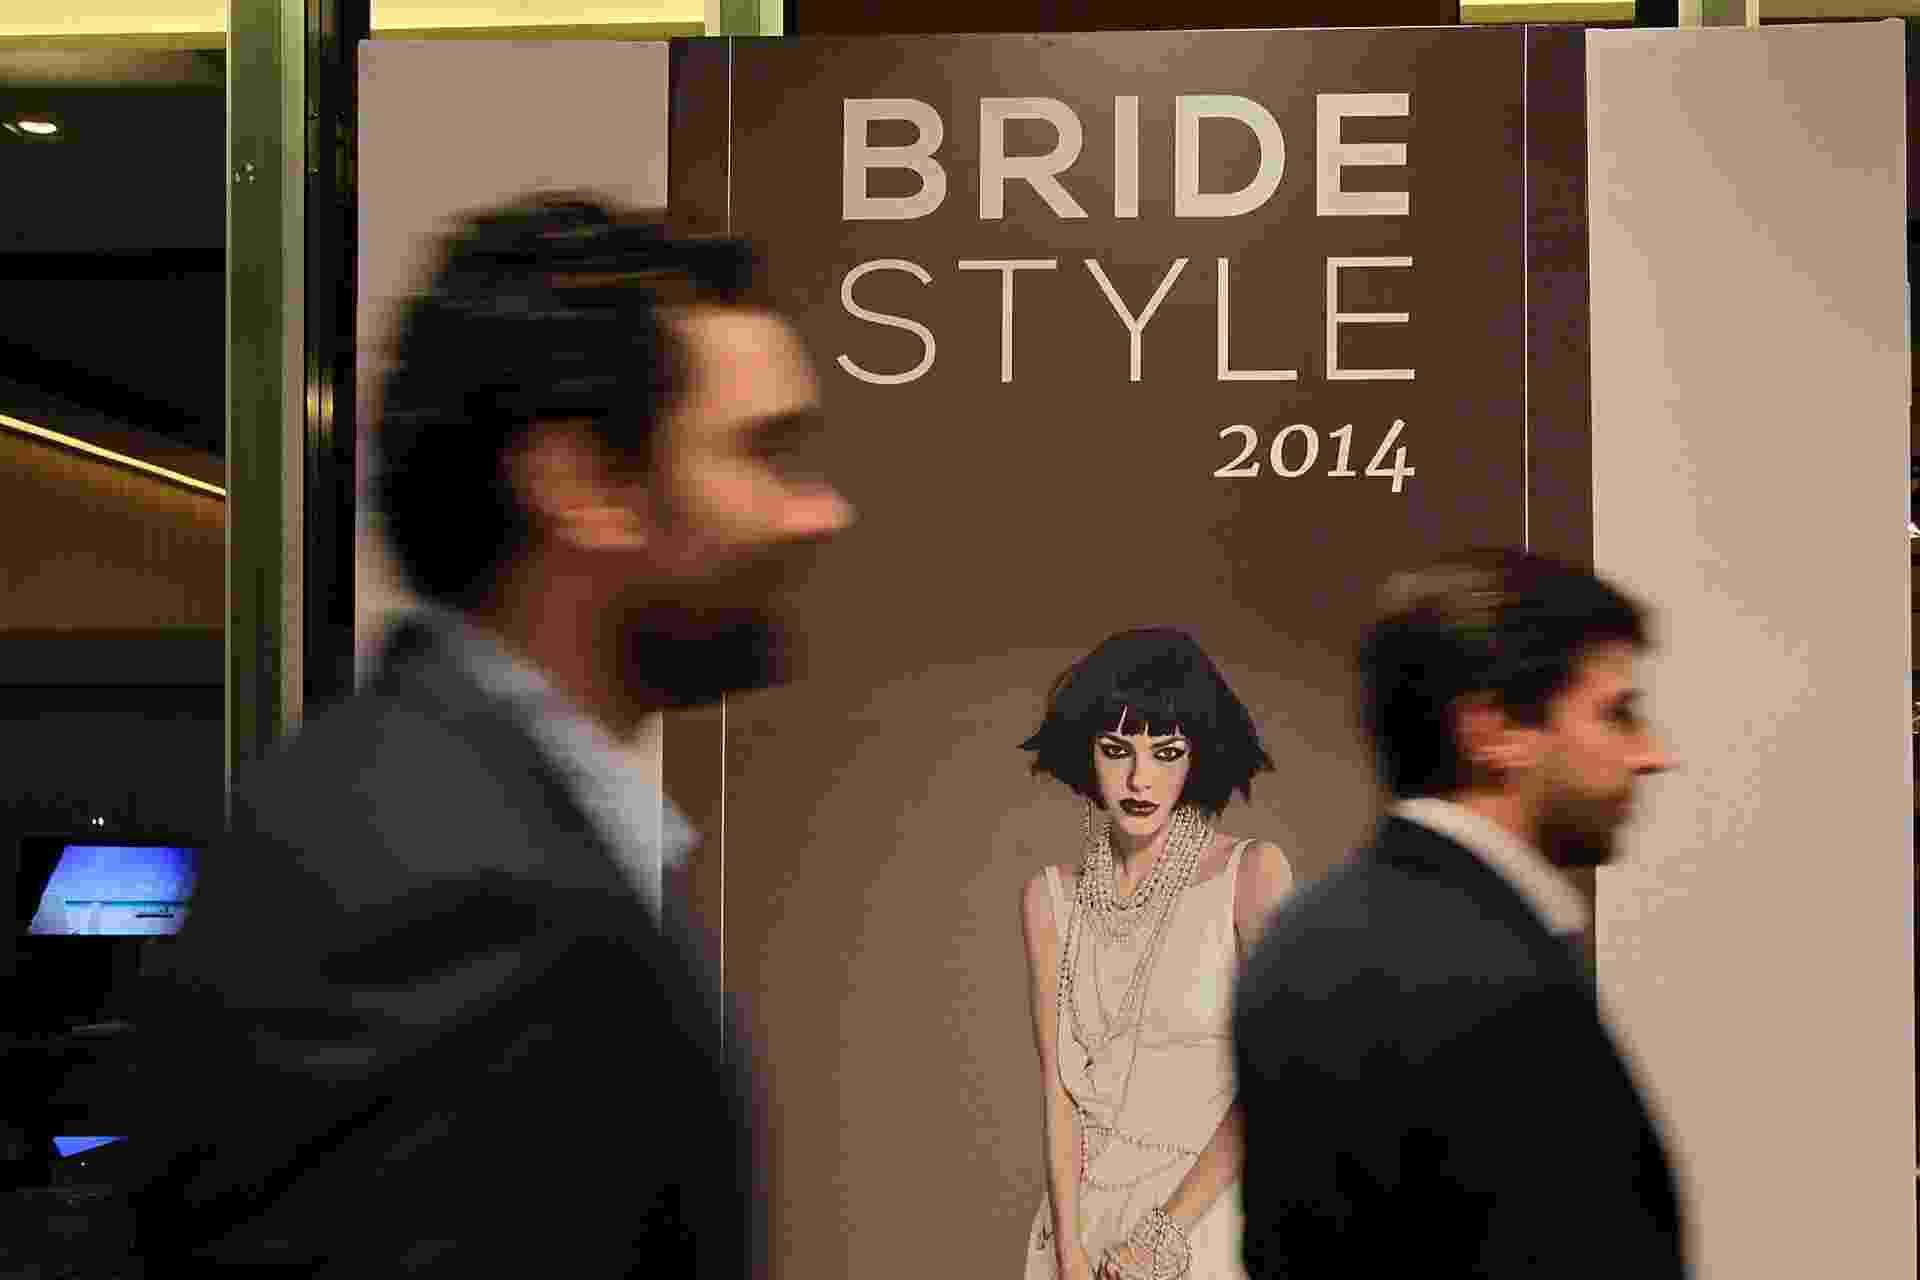 Bride Style 2014 - Reinaldo Canato/UOL